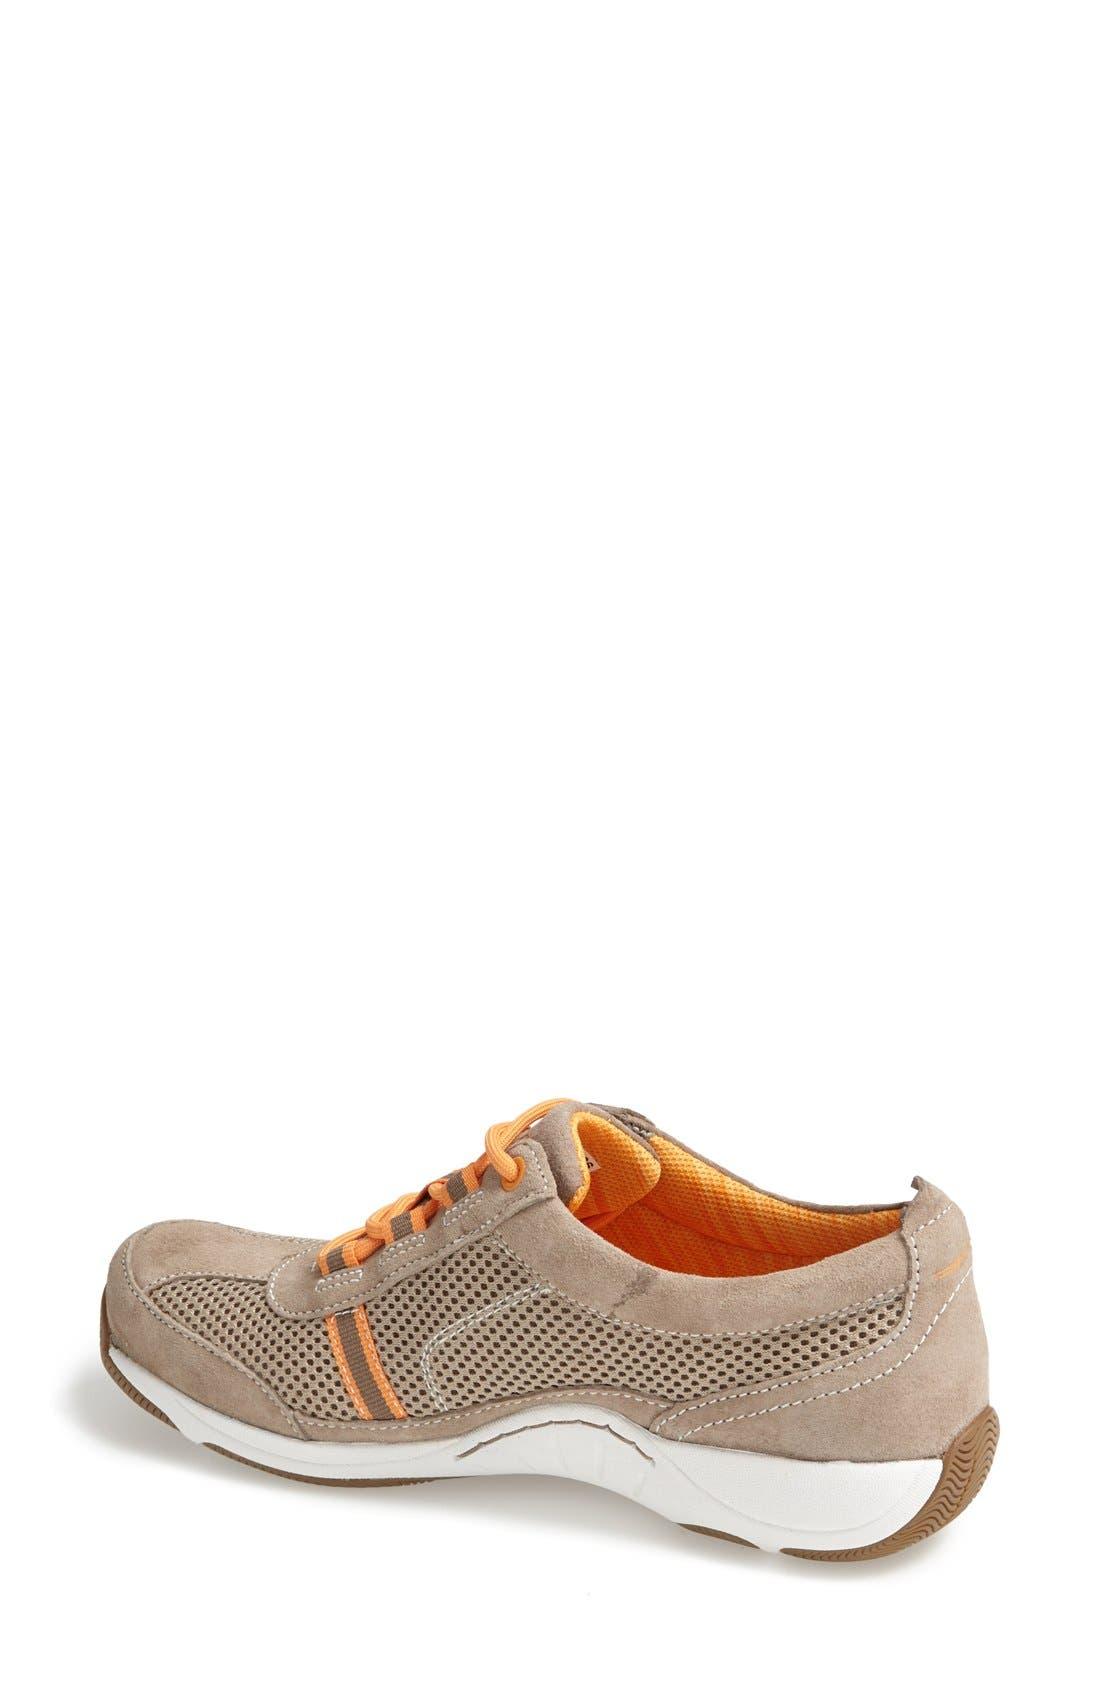 'Helen' Suede & Mesh Sneaker,                             Alternate thumbnail 83, color,